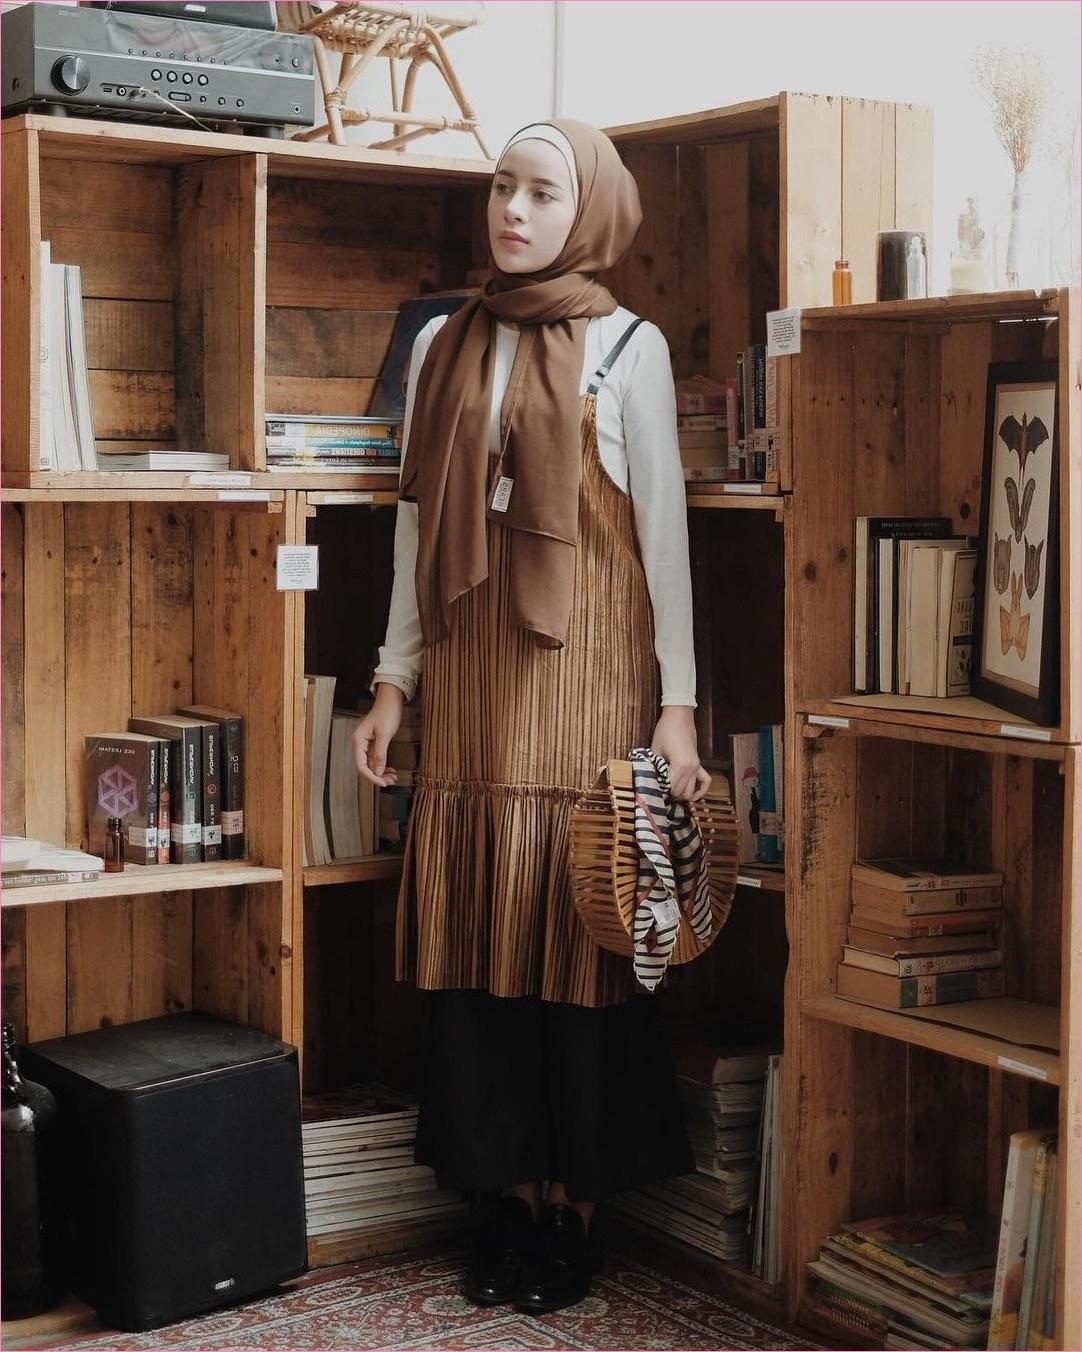 Model Baju Lebaran Pria 2019 9fdy 80 Model Baju Lebaran Terbaru 2019 Muslimah Trendy Model